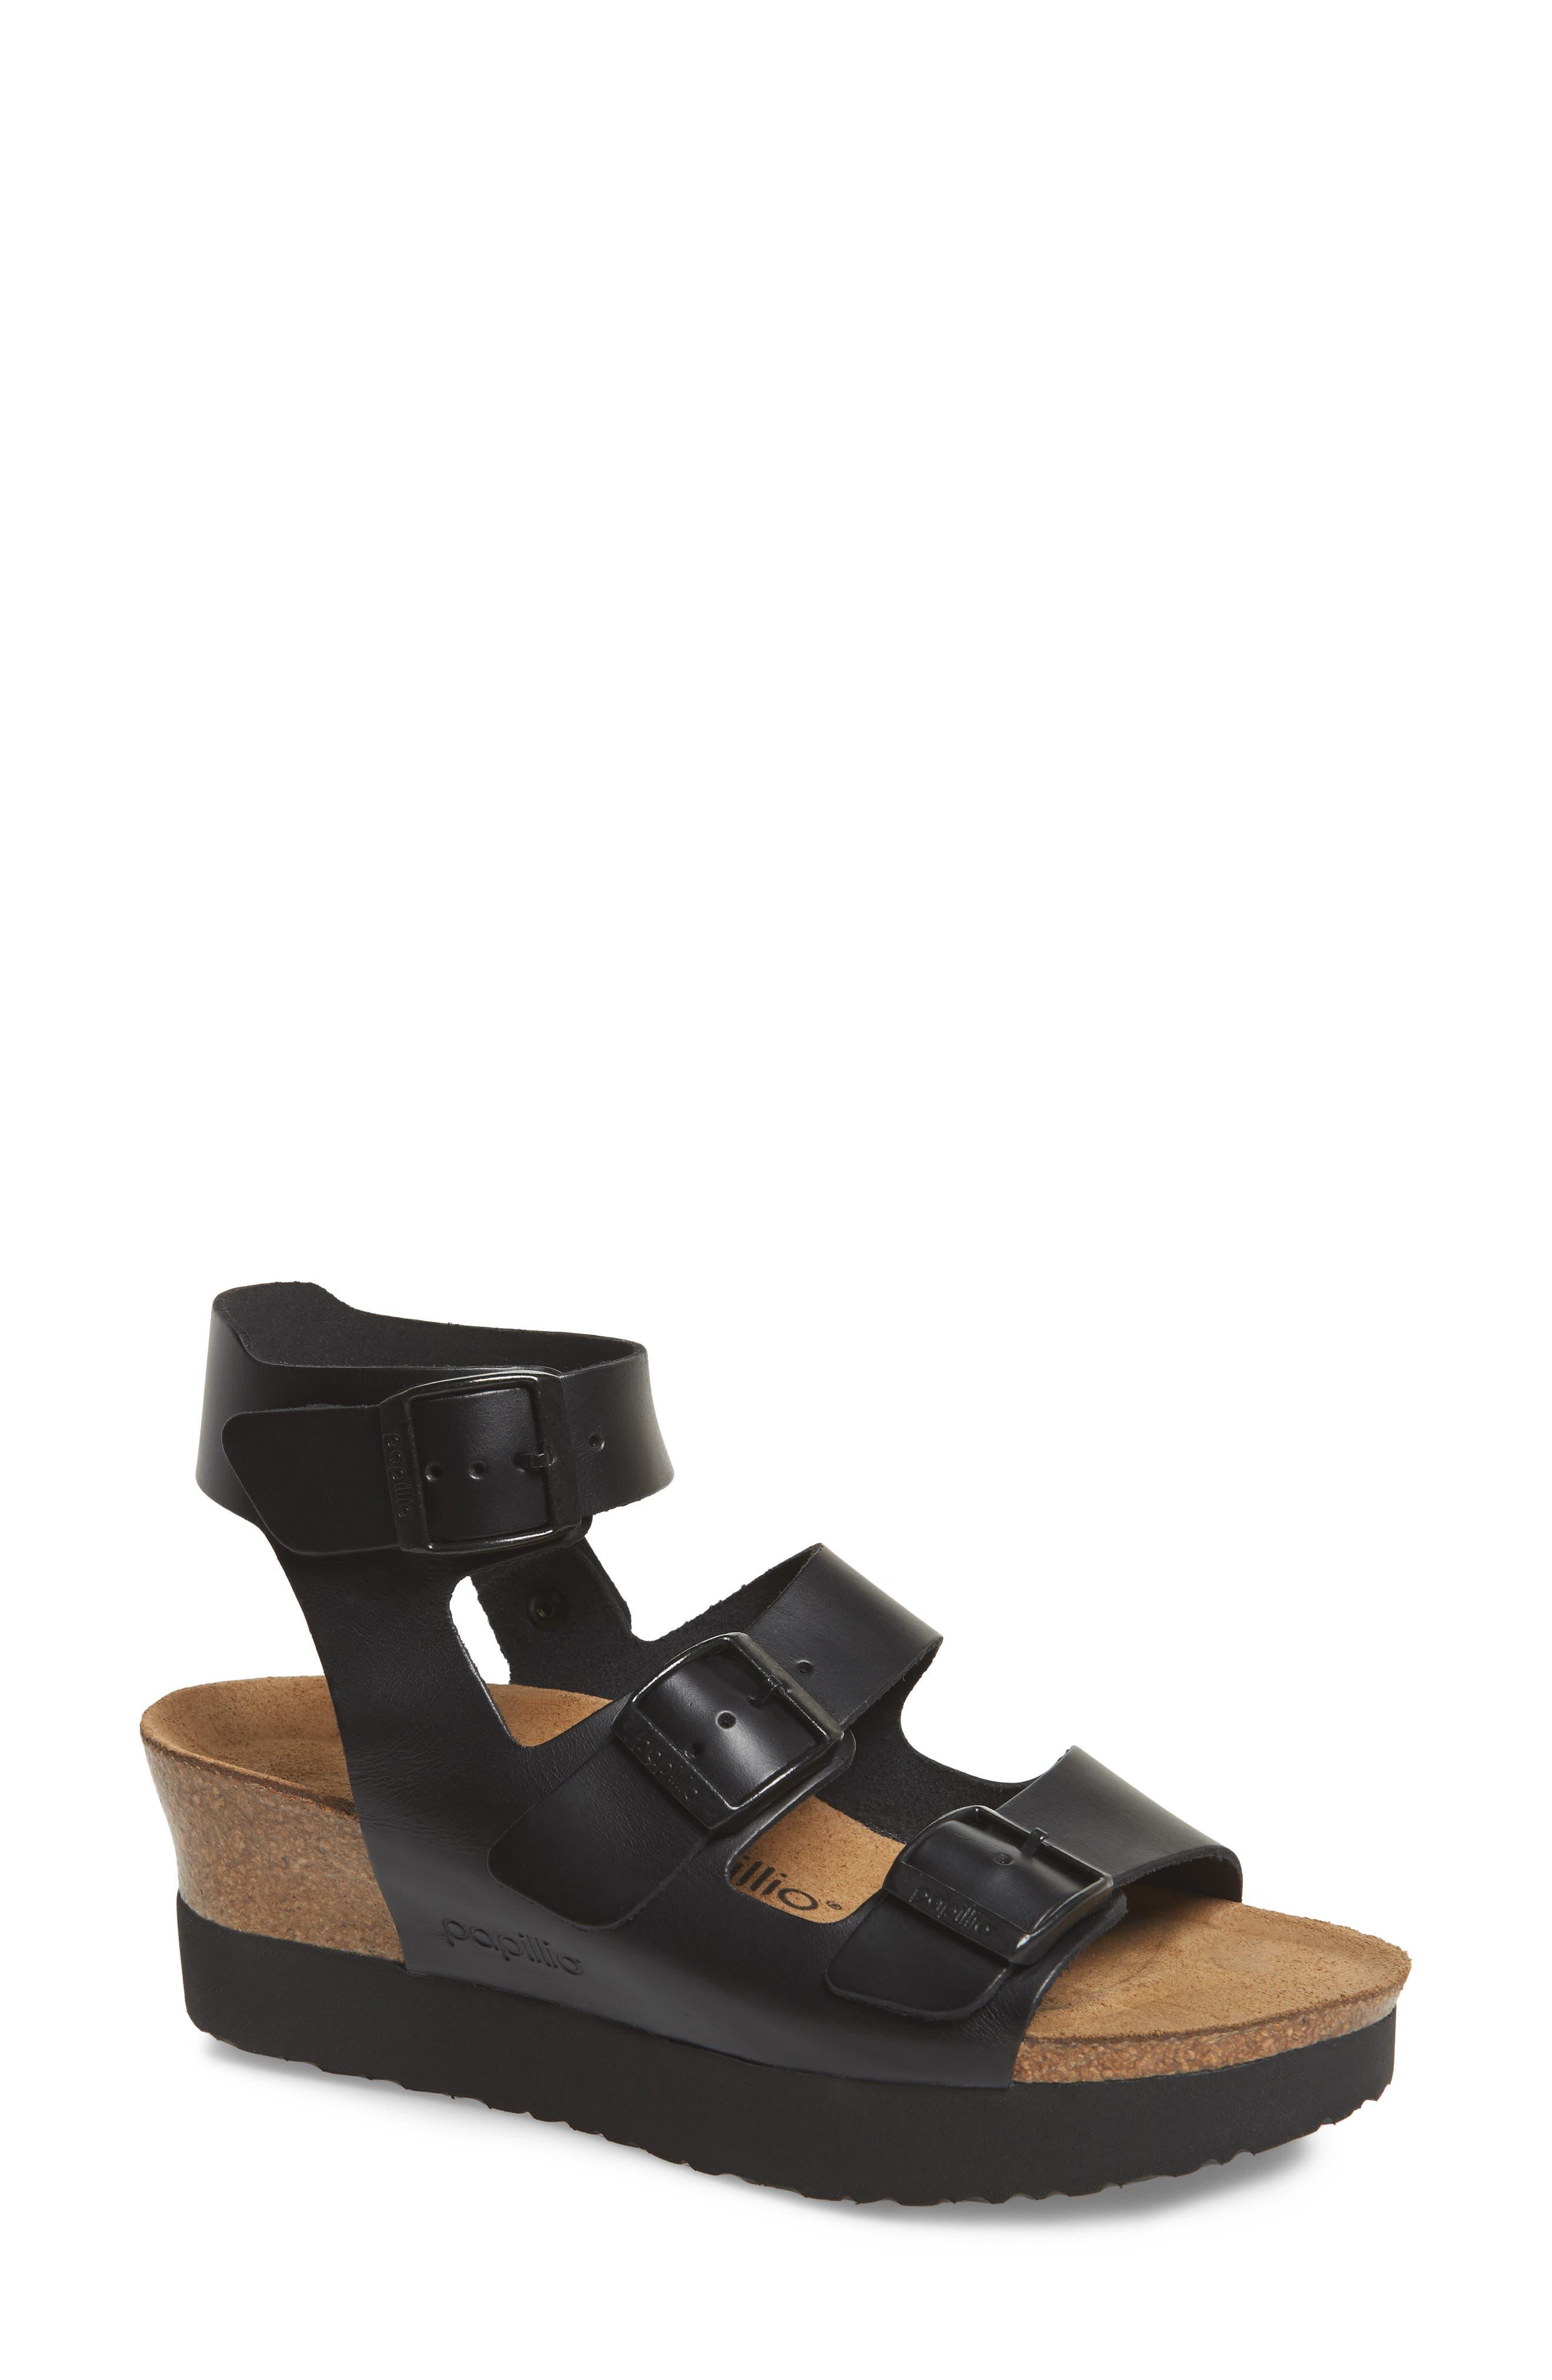 Papillio by Birkenstock Linnea Platform Sandal, Main, color, 001